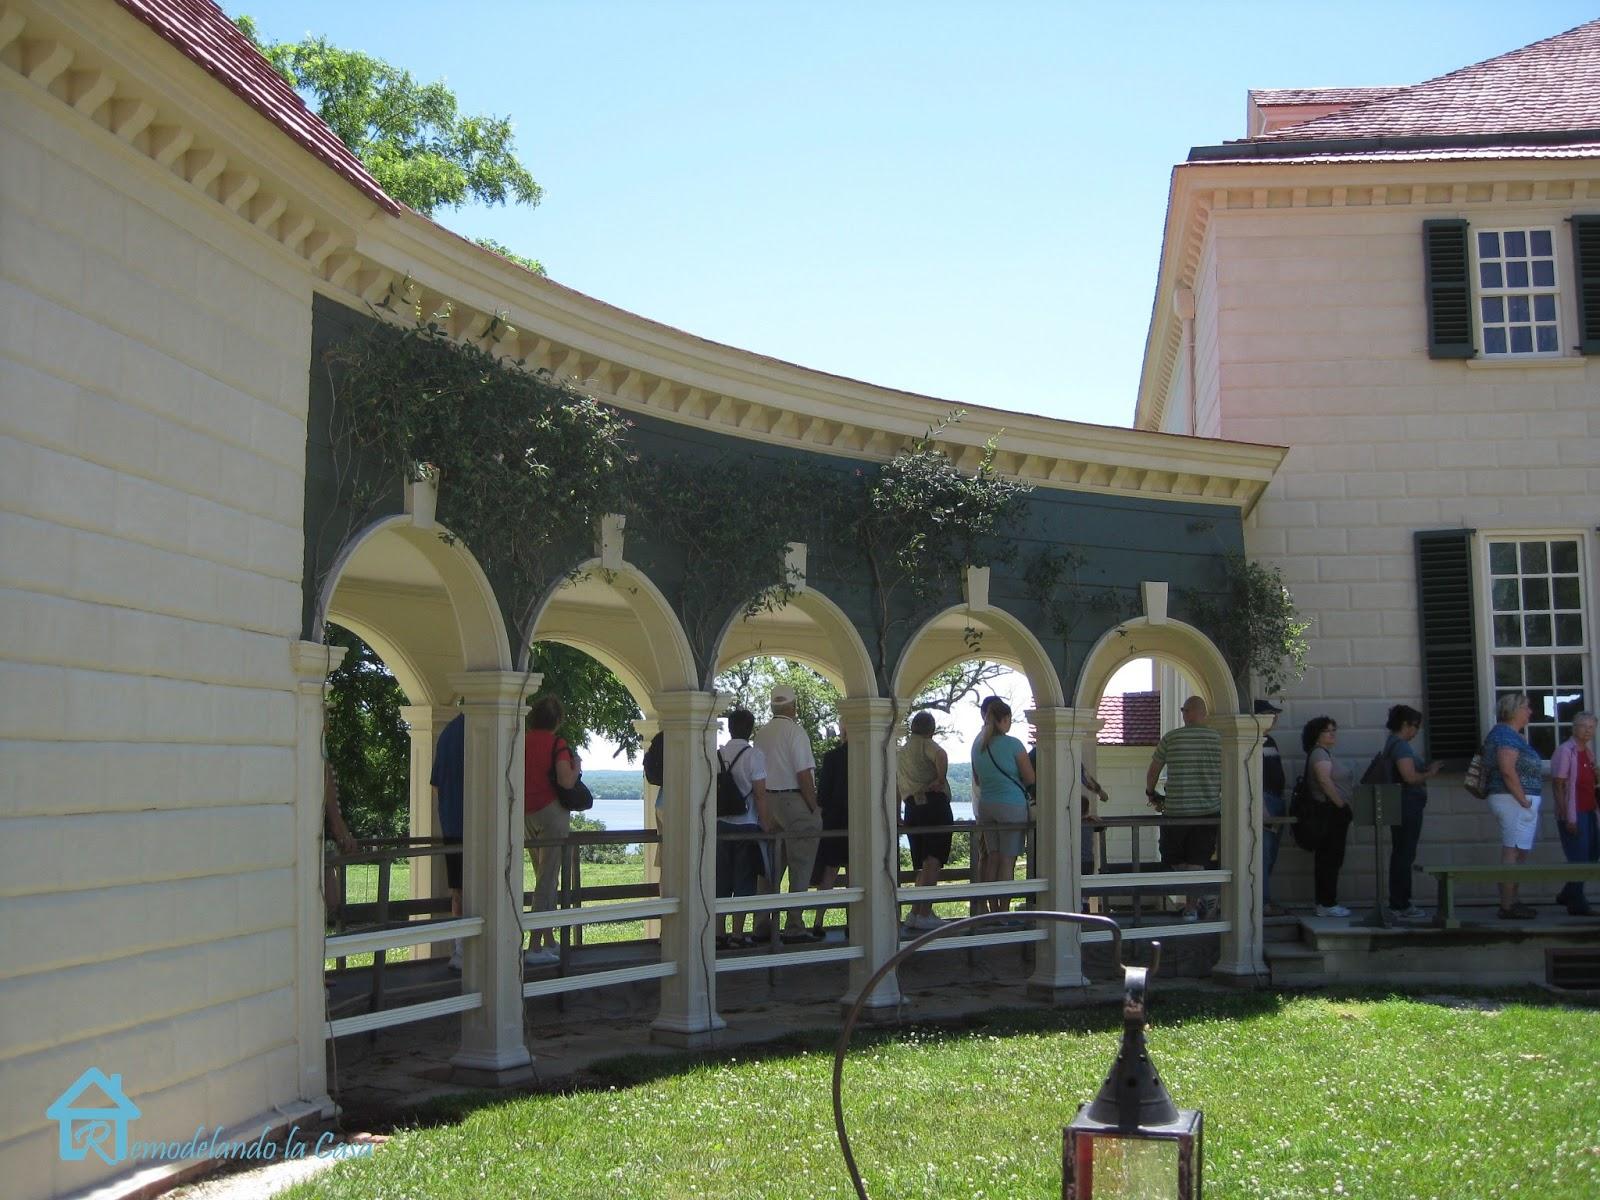 Virtual Remodel Kitchen Undermount Sinks Mount Vernon - 1 Remodelando La Casa